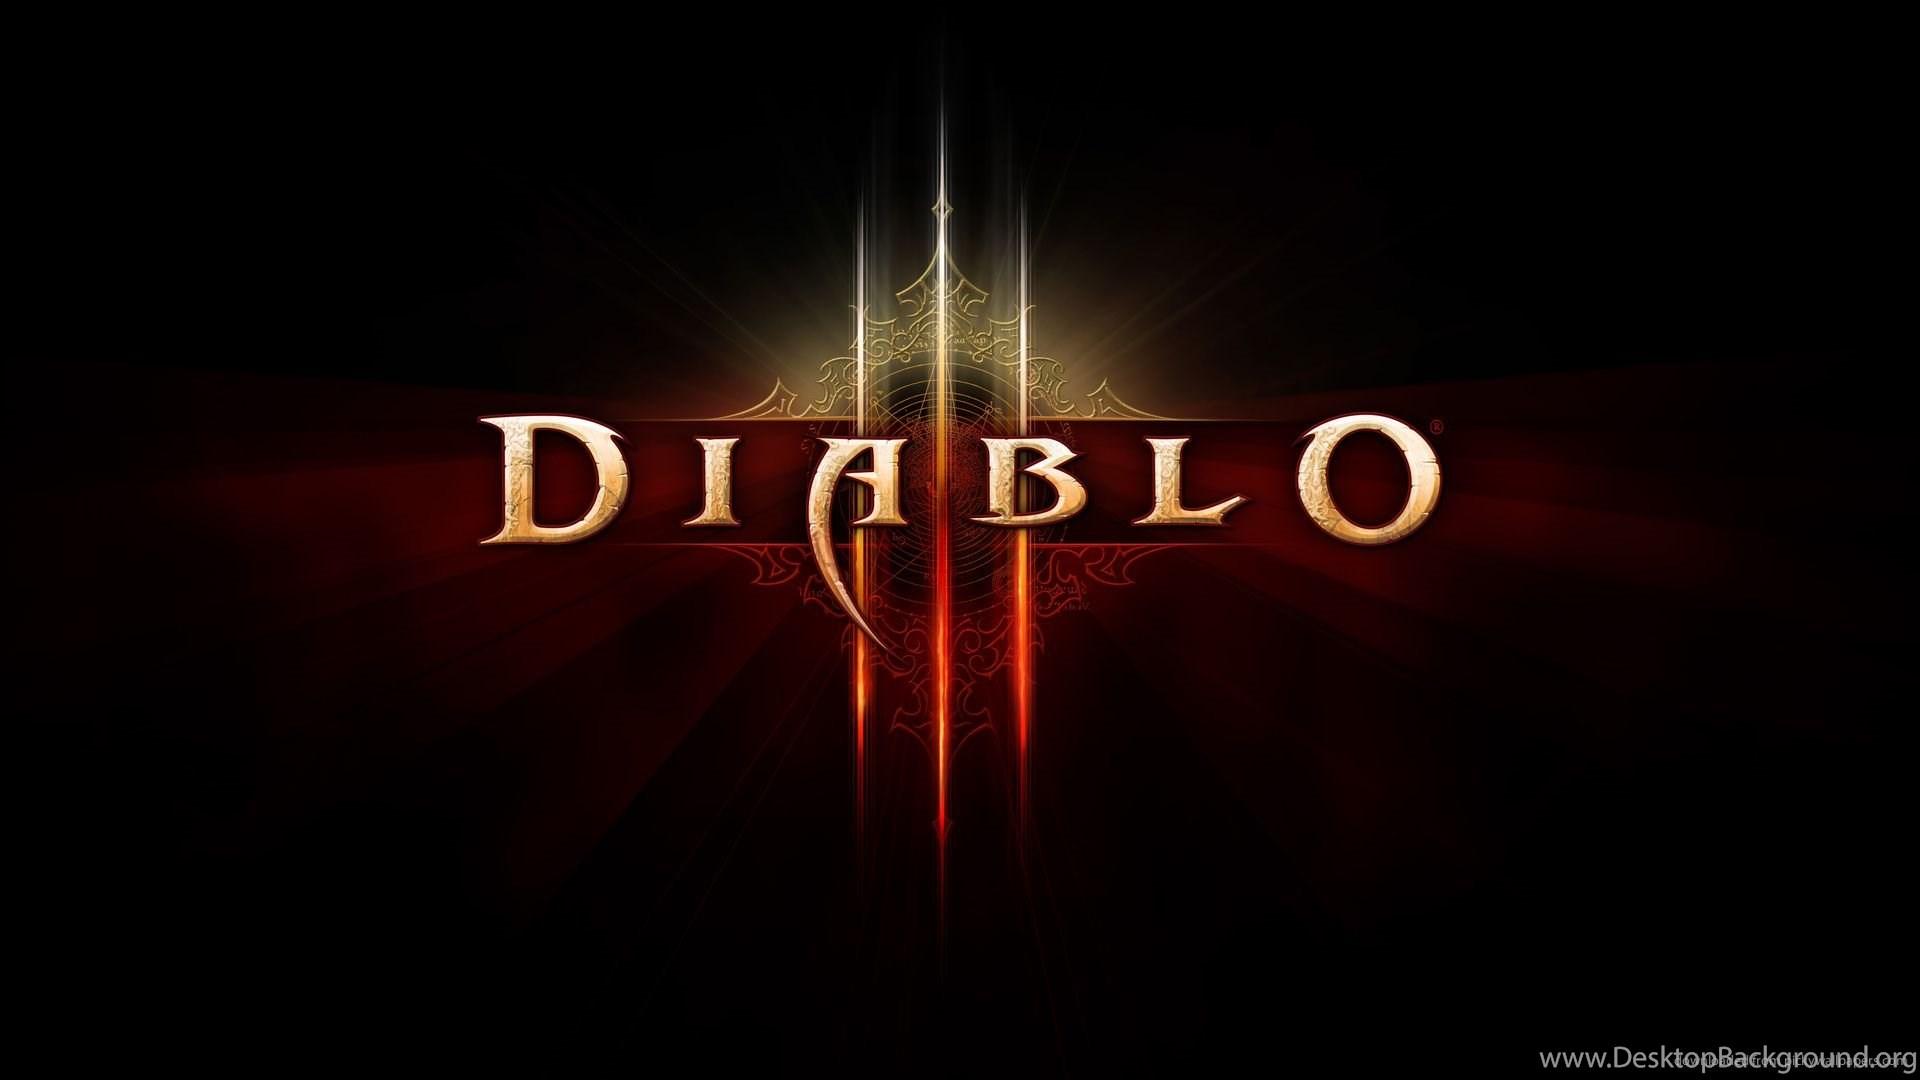 Download 1920x1080 Diablo 3 Hd Logo Wallpapers Desktop Background